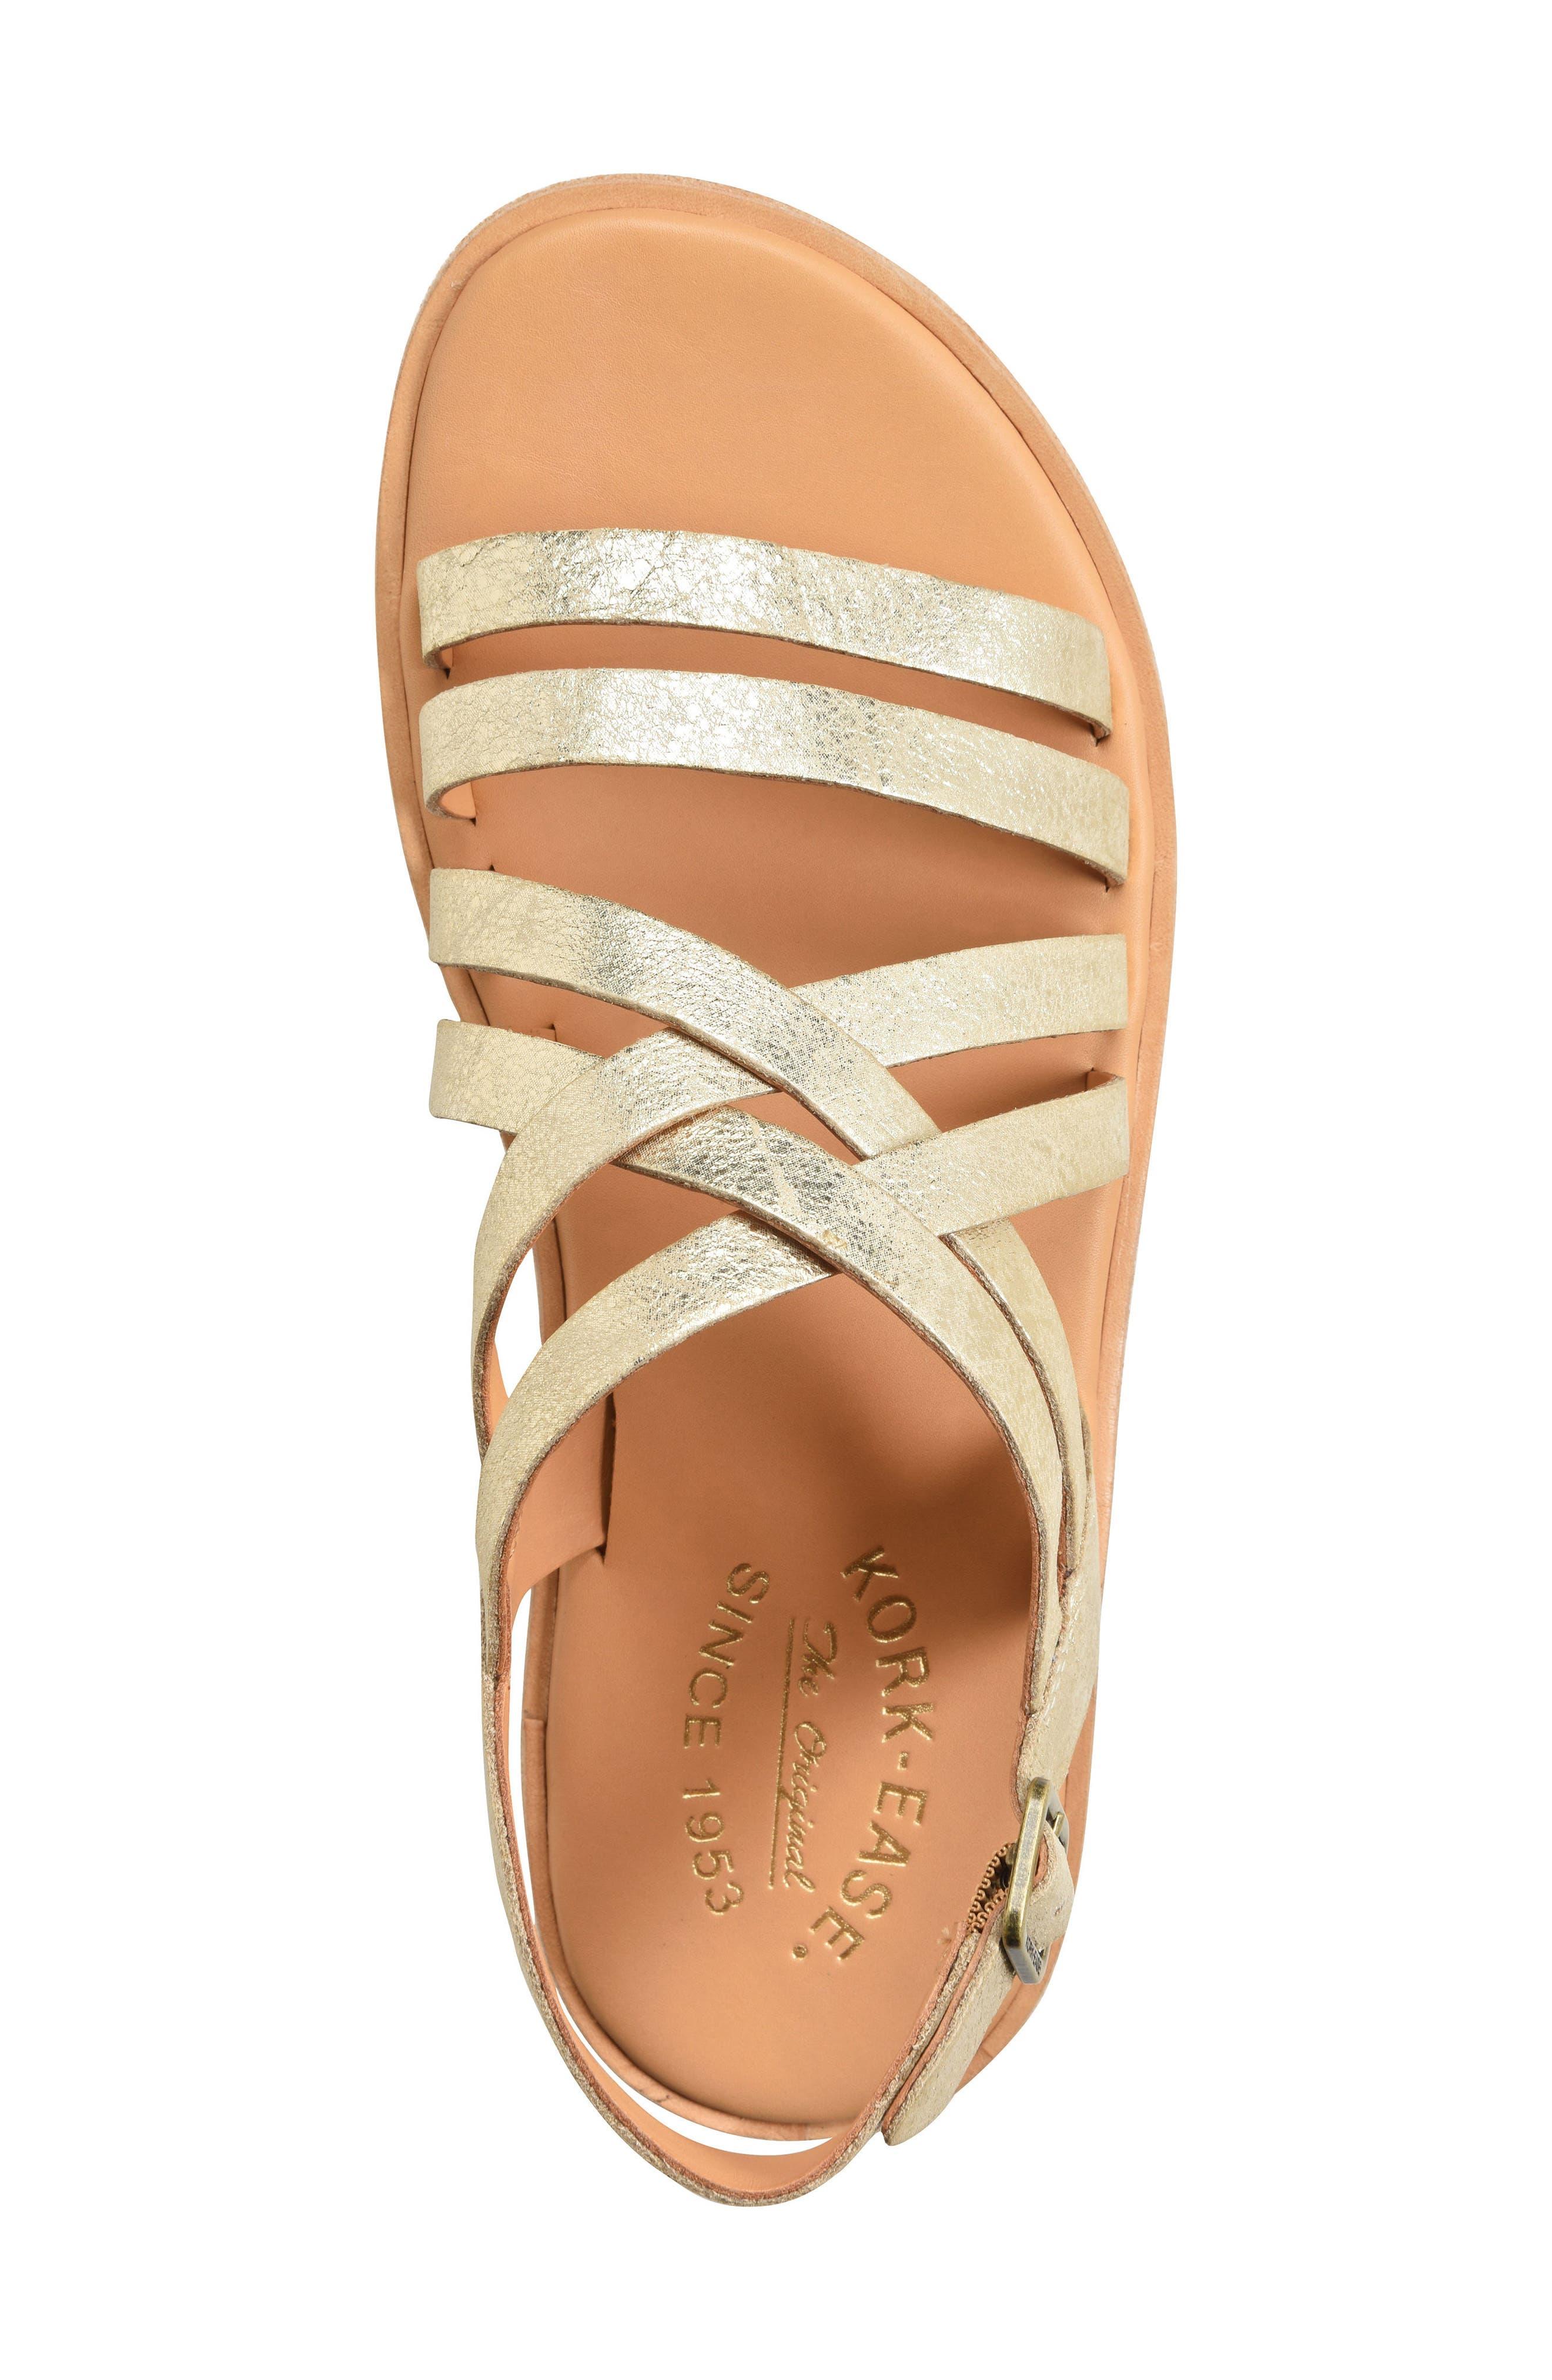 Nicobar Sandal,                             Alternate thumbnail 5, color,                             Gold Metallic Leather